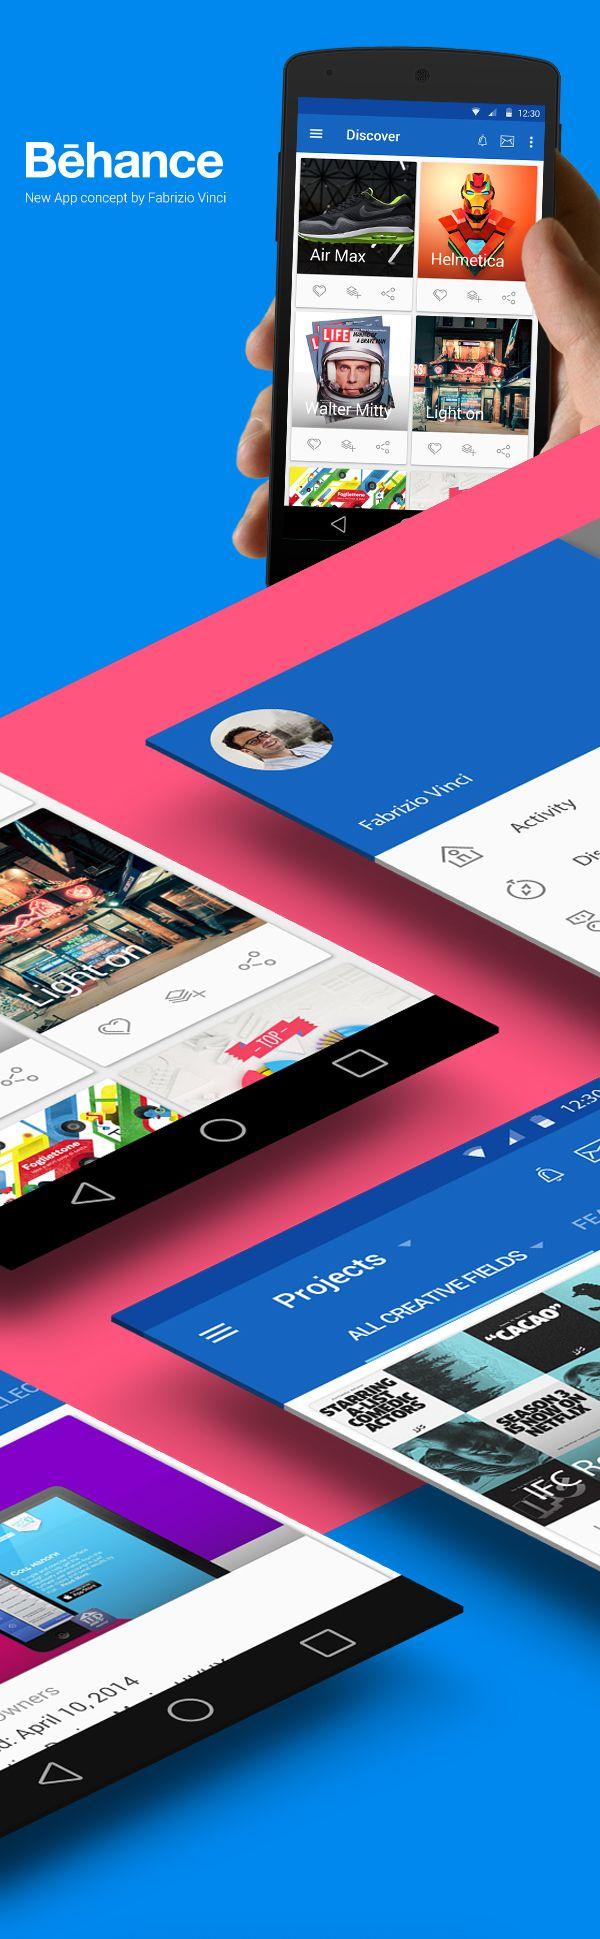 Behance New App Concept (Material Design) on Behance